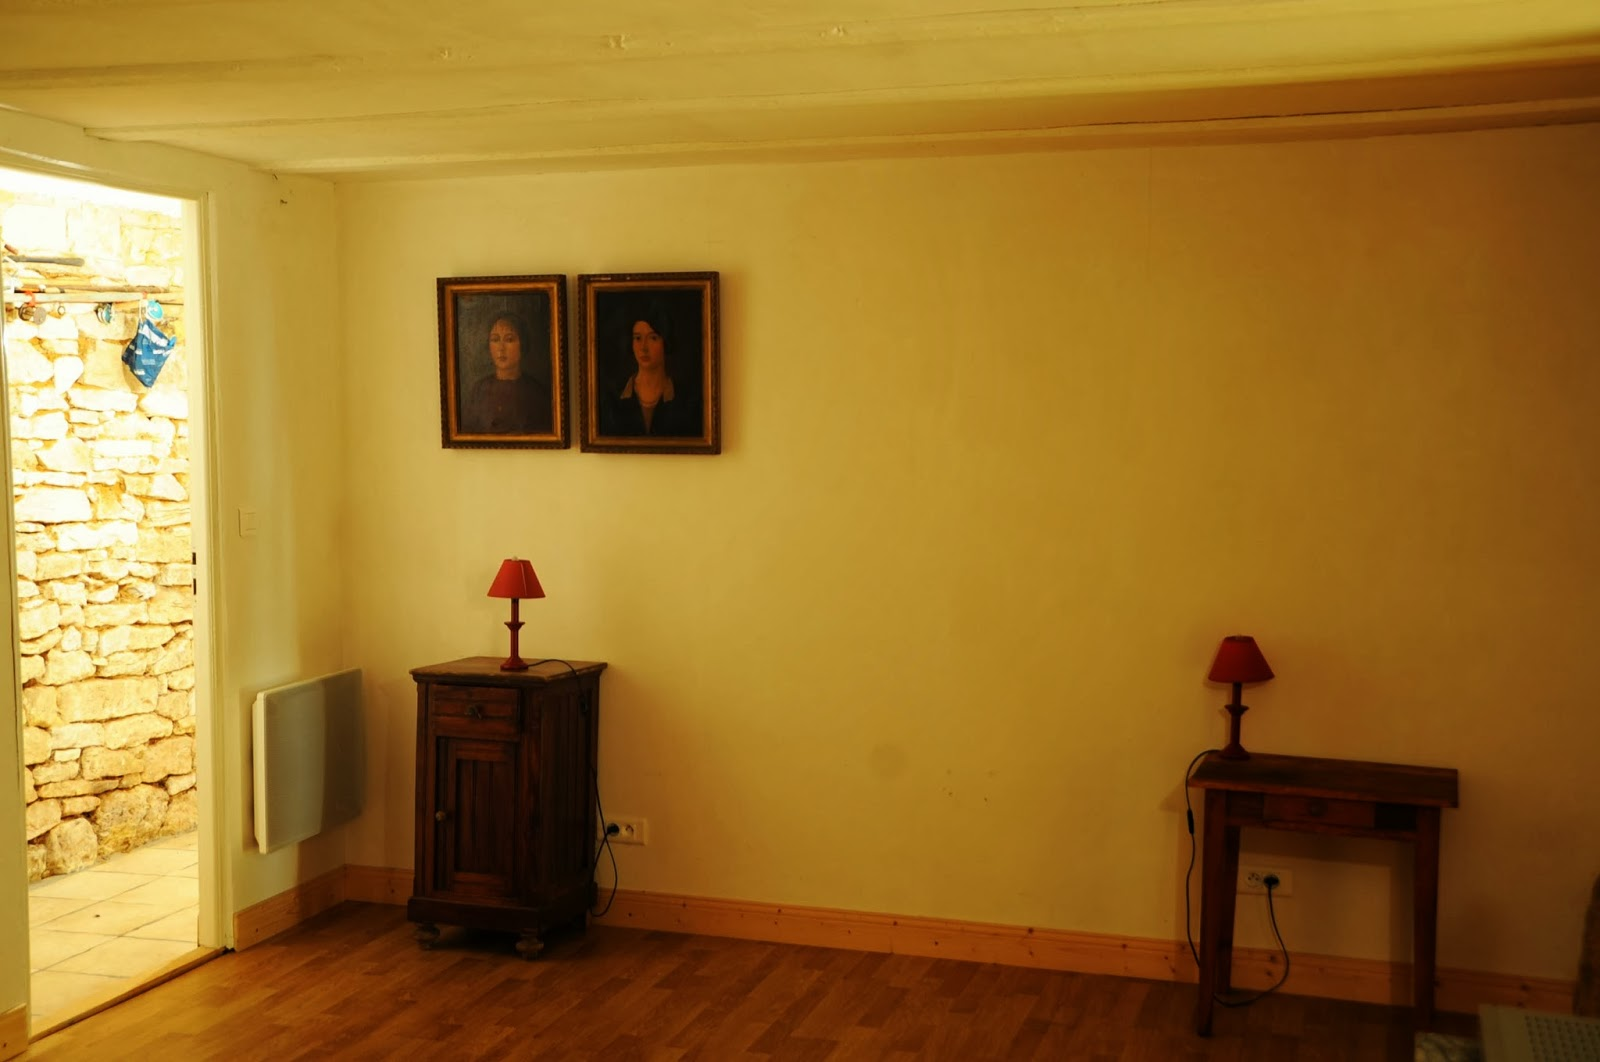 l badkamer aarden] - 100 images - aarding badkamer belgie ...